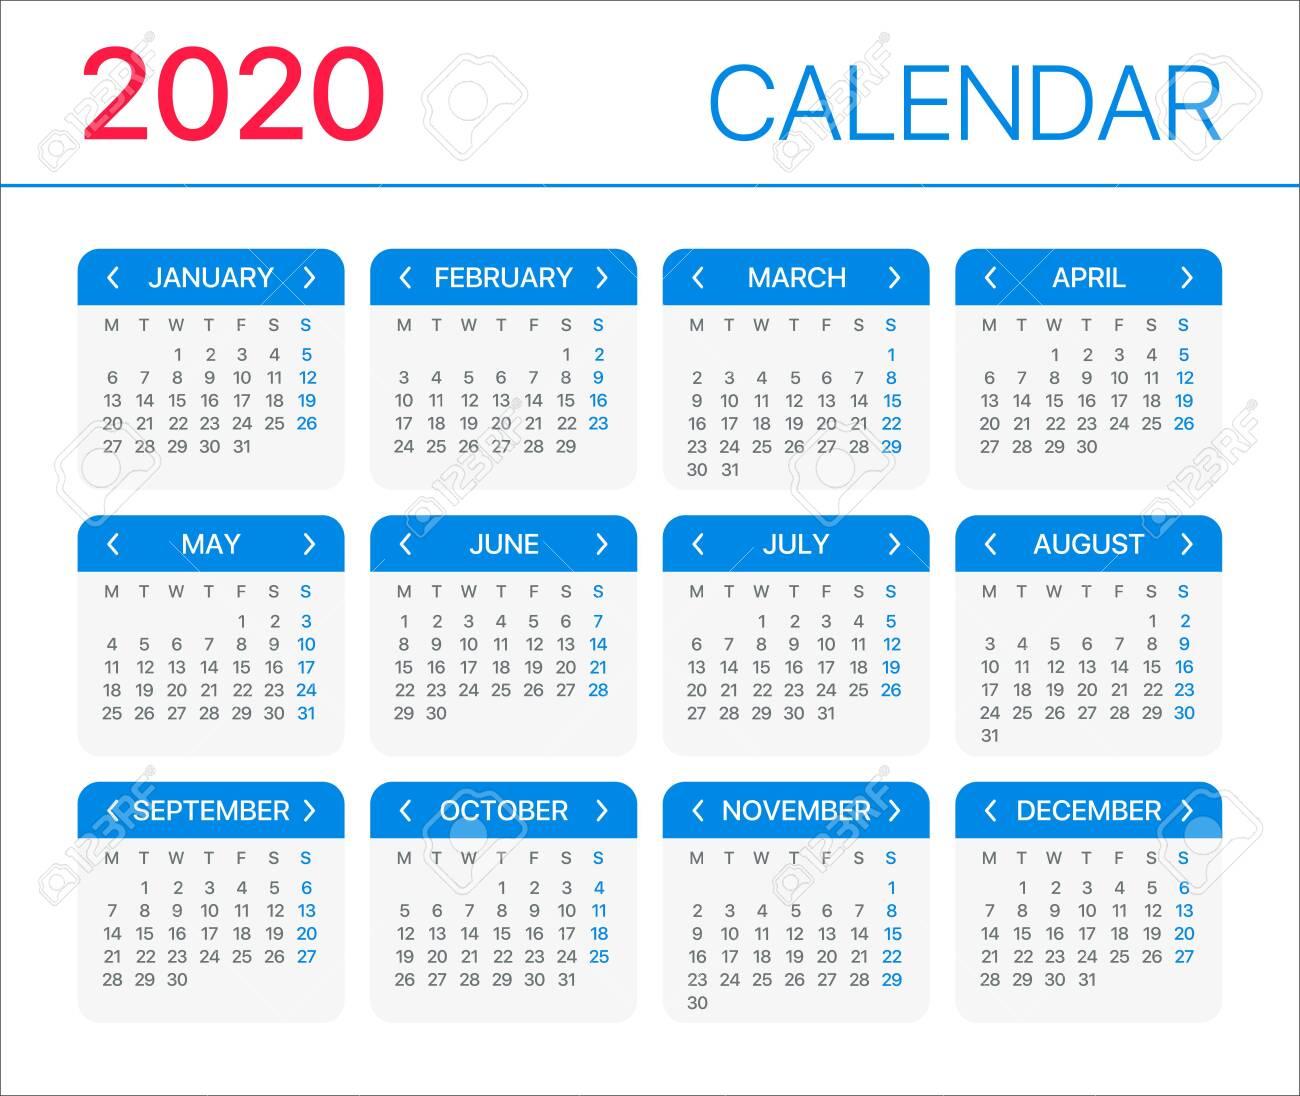 2020 Calendar - Monday To Sunday - Vector Template throughout 2020 Monday Through Sunday Calendar Template